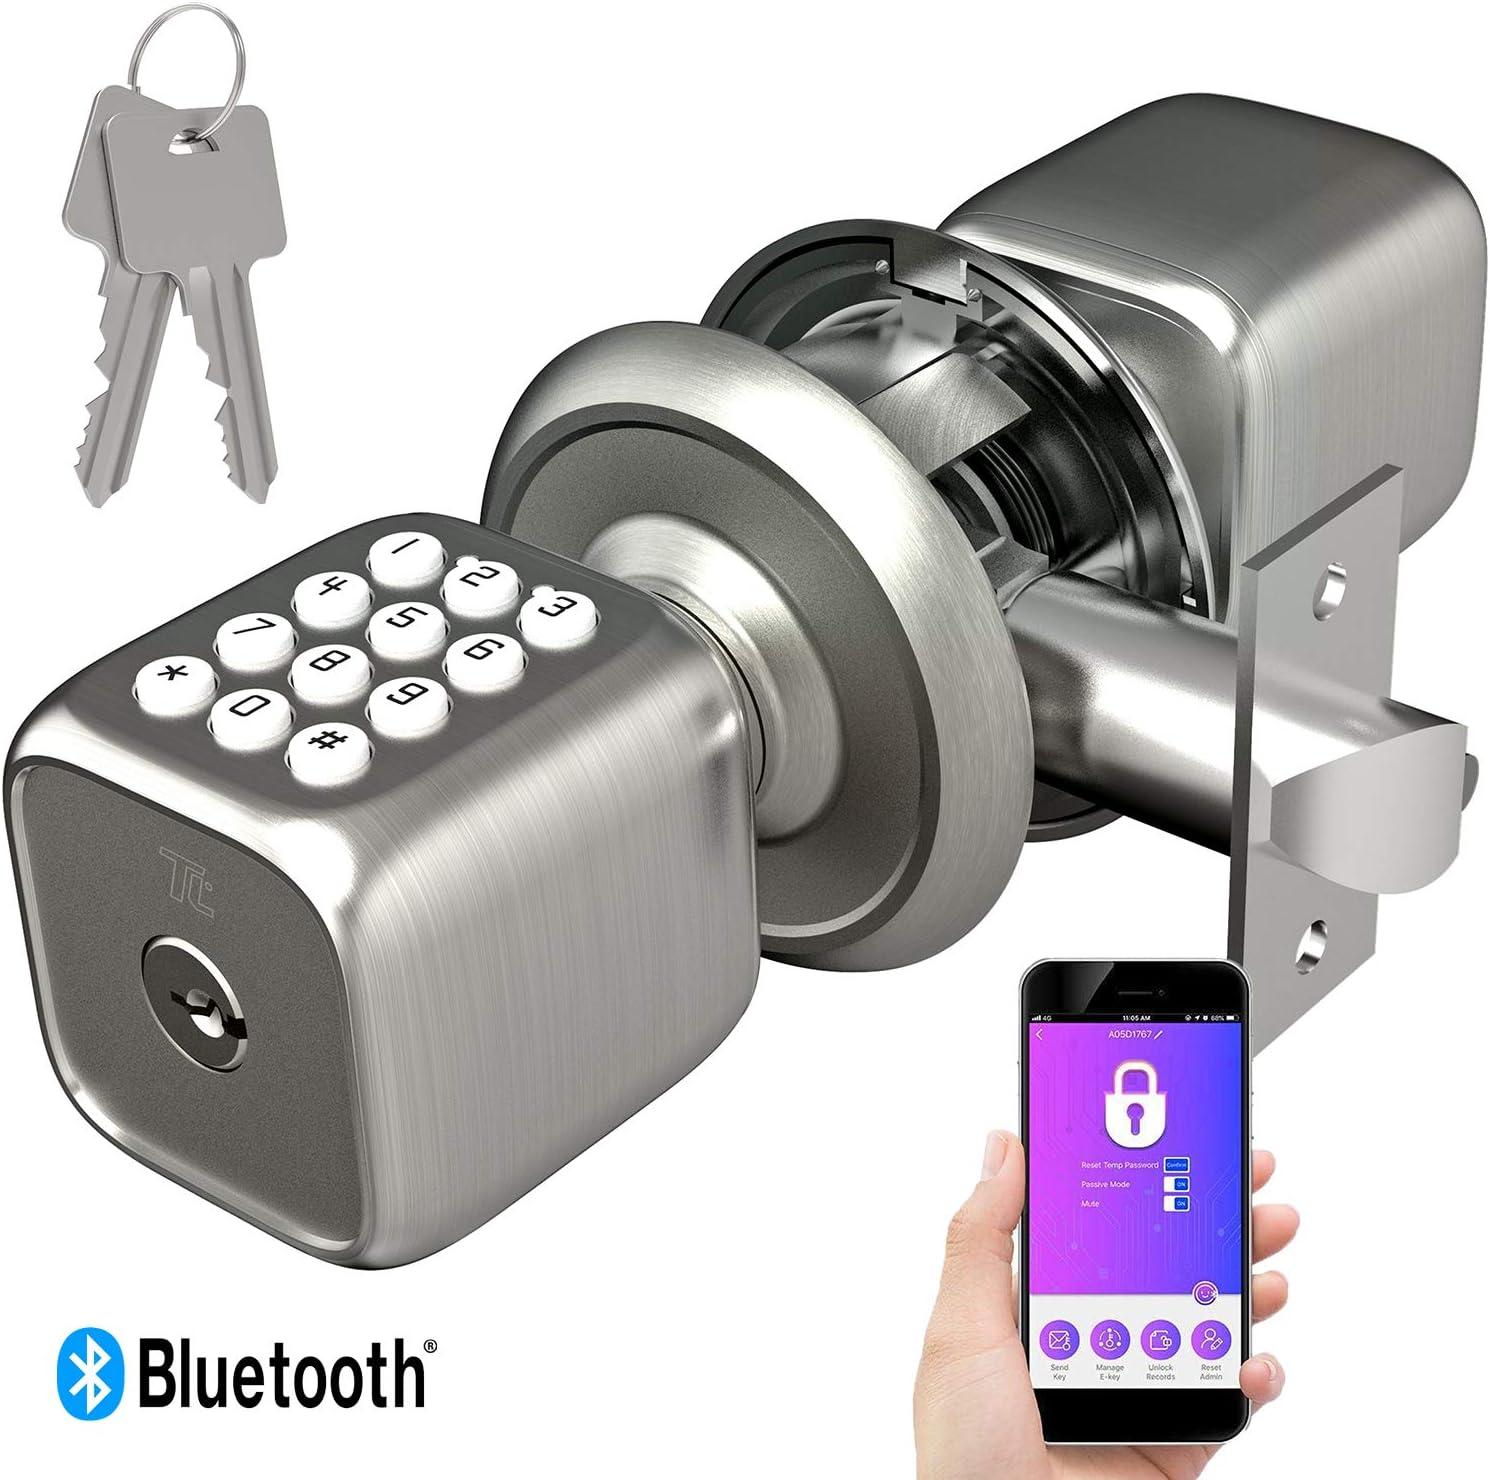 TURBOLOCK TL-111 PRO Smart Door Lock   Send eKeys w/App   Keypad Door Knob-Styled Keyless Entry   Digital Security w/Backup Keys & Emergency Power Port (Brush Nickel)